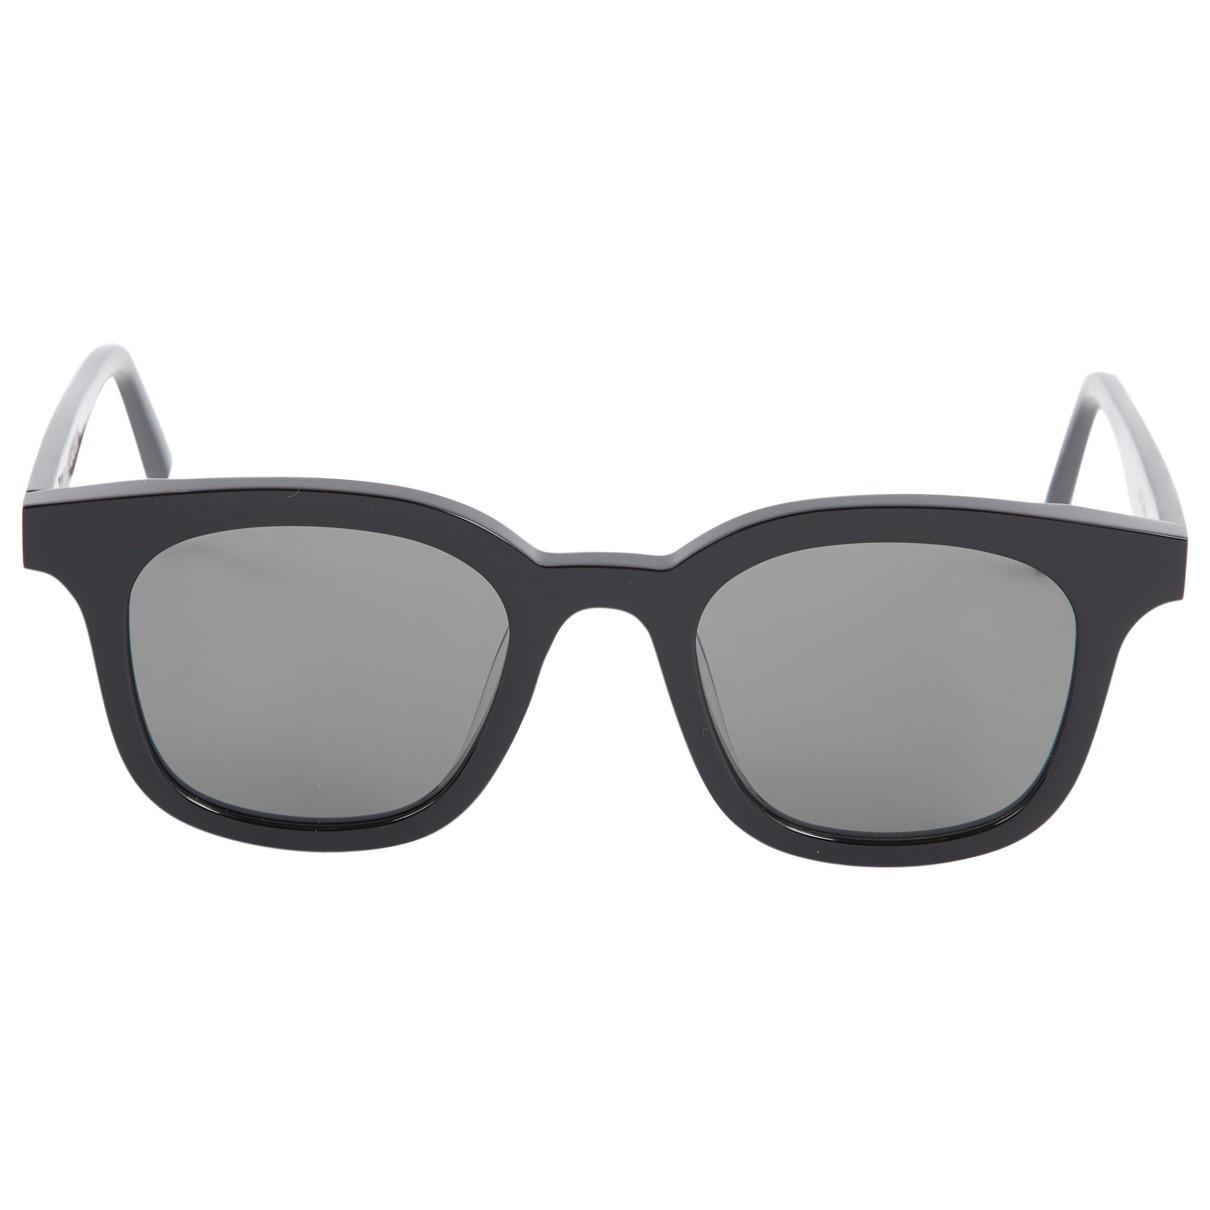 f47549bb26661 Lyst - Gentle Monster Black Plastic Sunglasses in Black